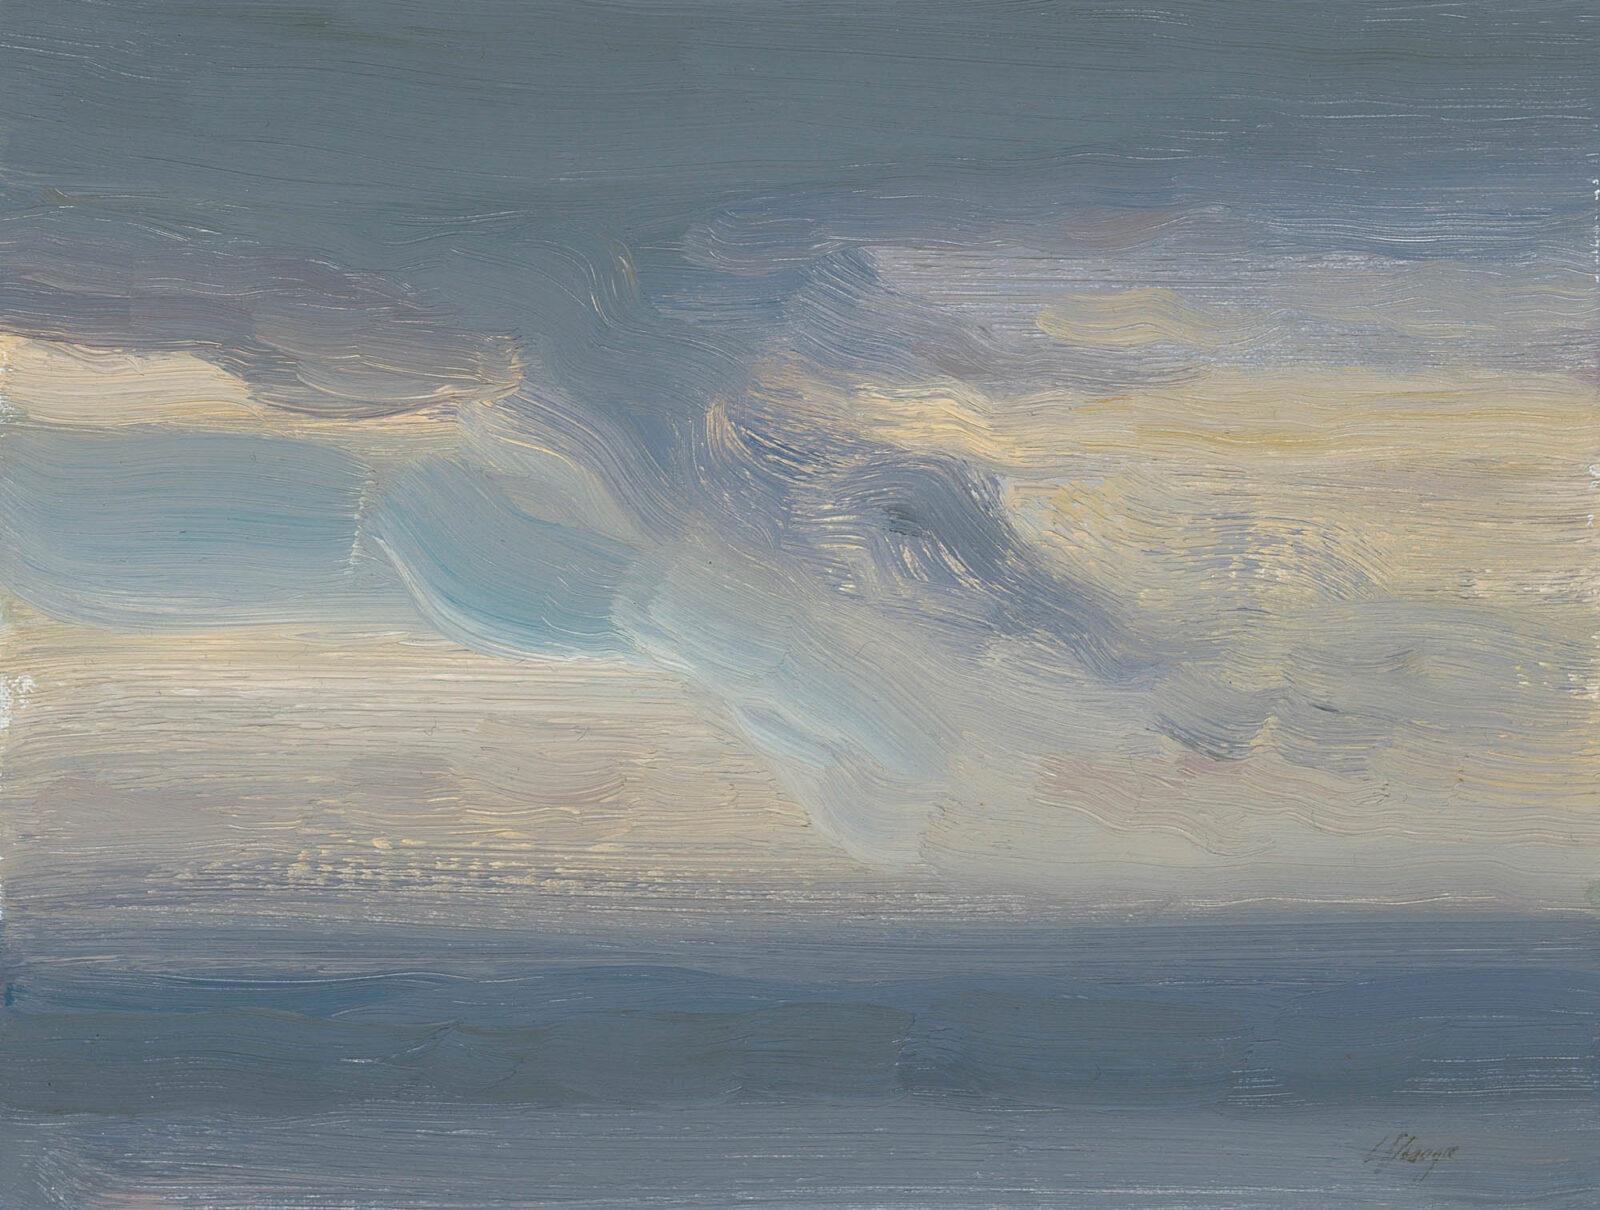 Liza Visagie - Ocean View. Oil on Linen 6 x 7.5 inches